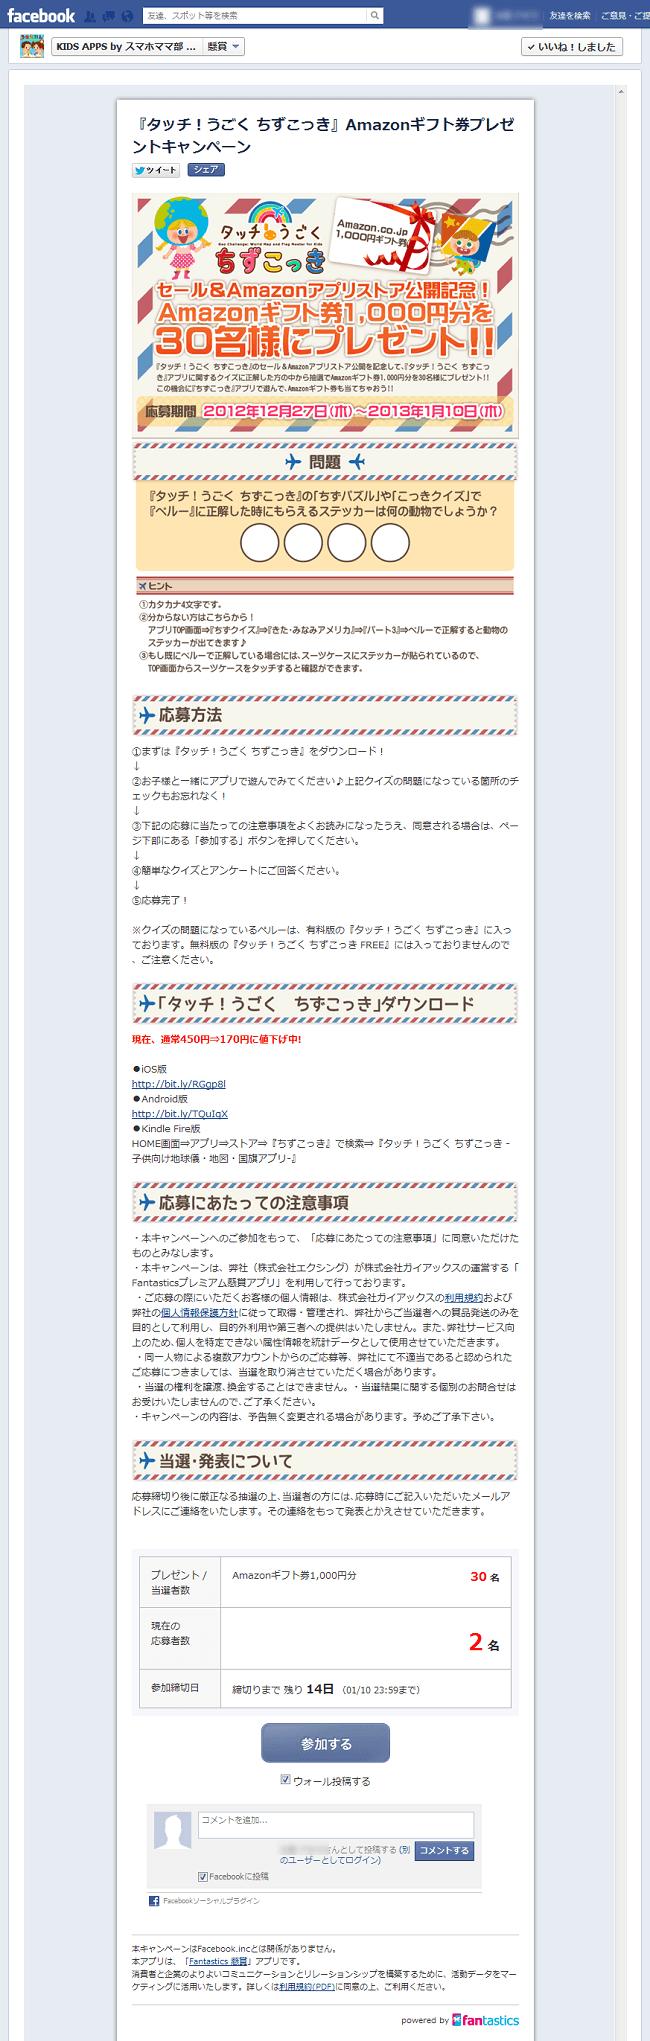 Fantastics 「クイズ型」懸賞アプリ(KIDS APPS by スマホママ部様)